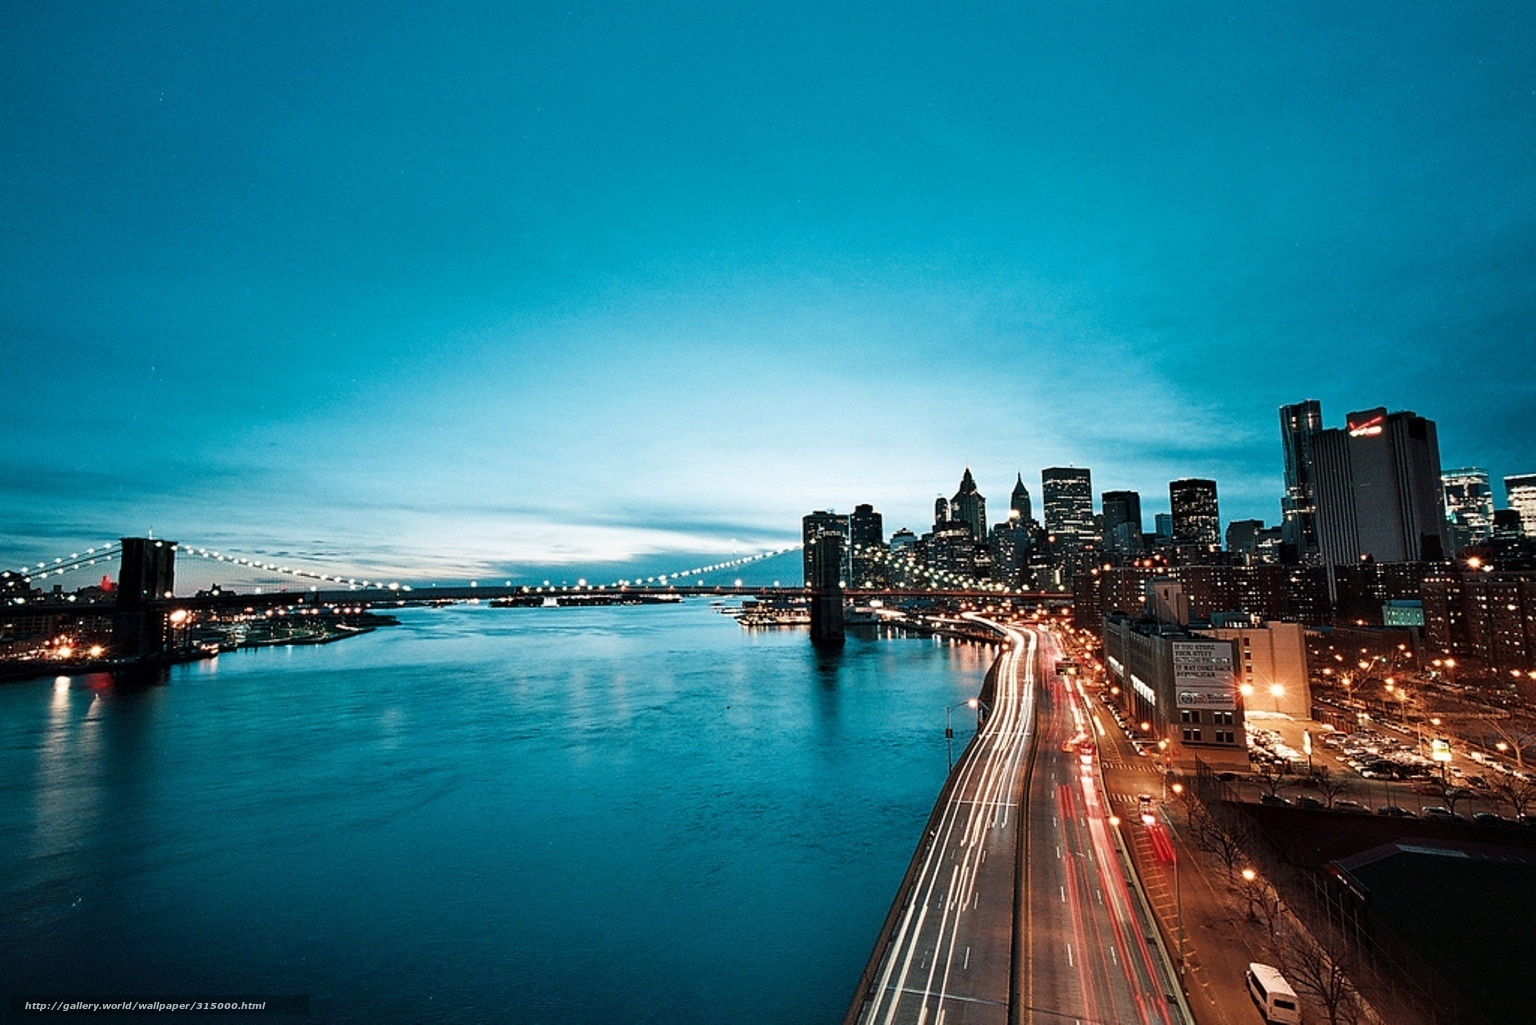 Download Wallpaper City, Coastal, Night, Lights Free Desktop Wallpaper In  The Resolution 1536x1025 U2014 Picture №315000